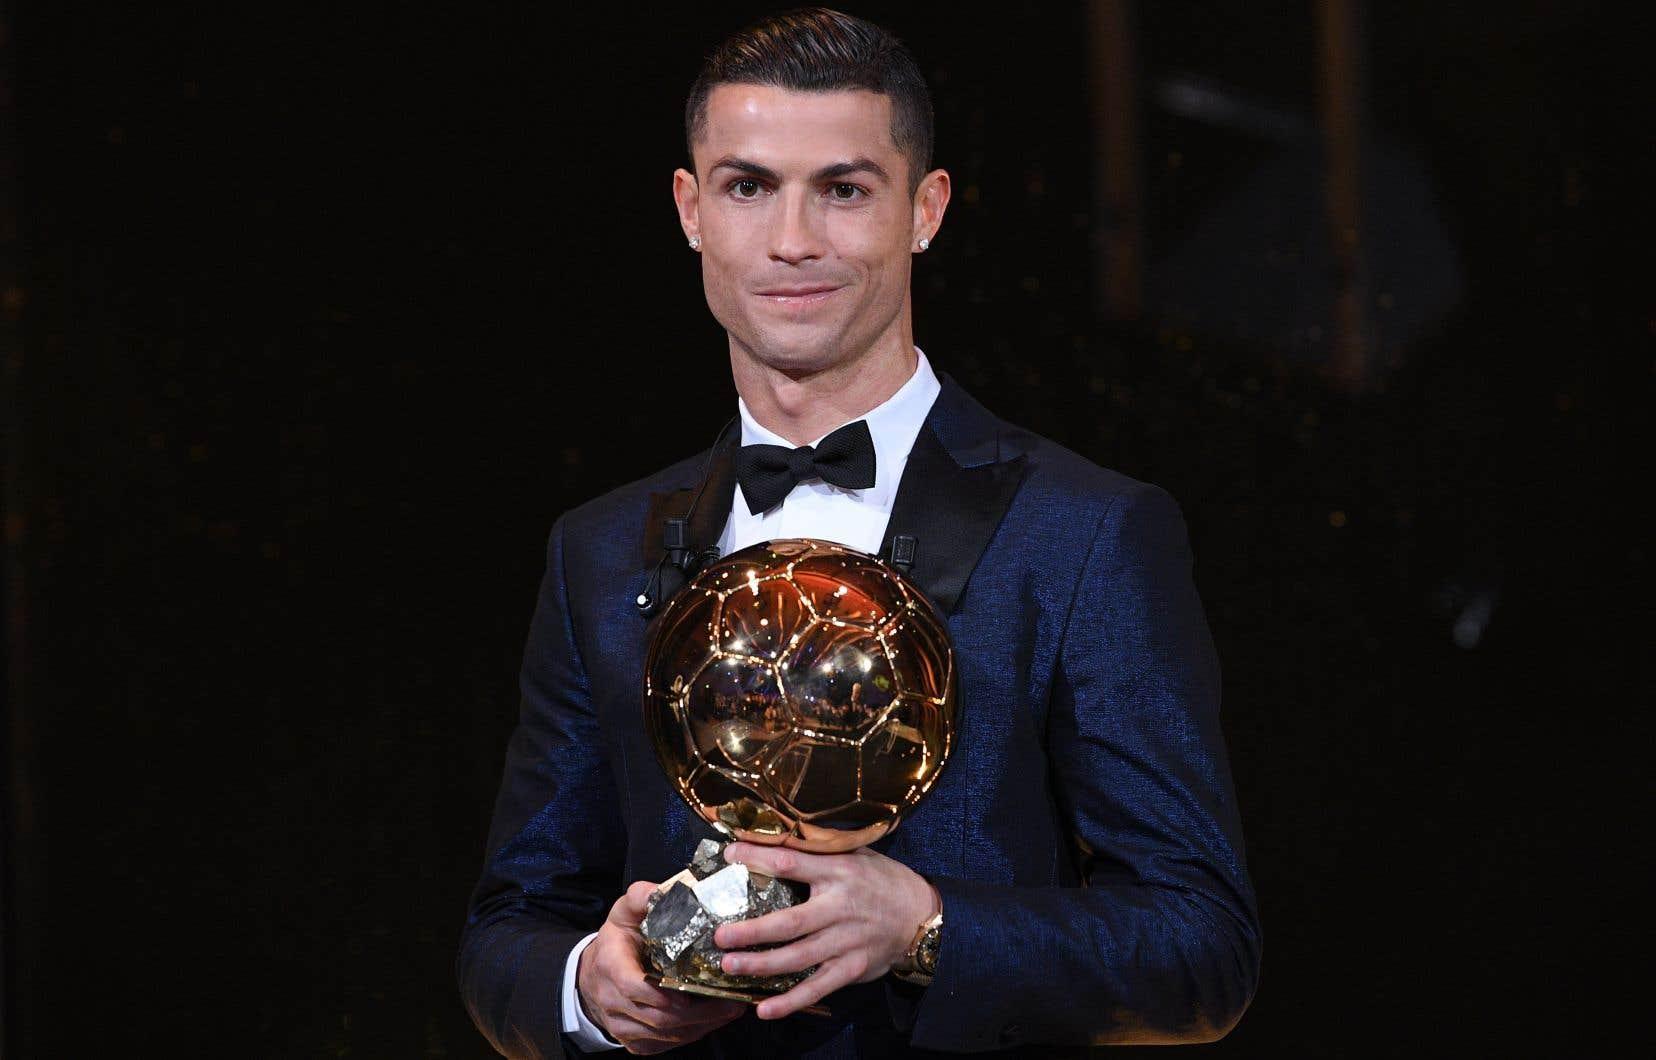 Cristiano Ronaldo a remporté sans surprise son cinquième Ballon d'Or.